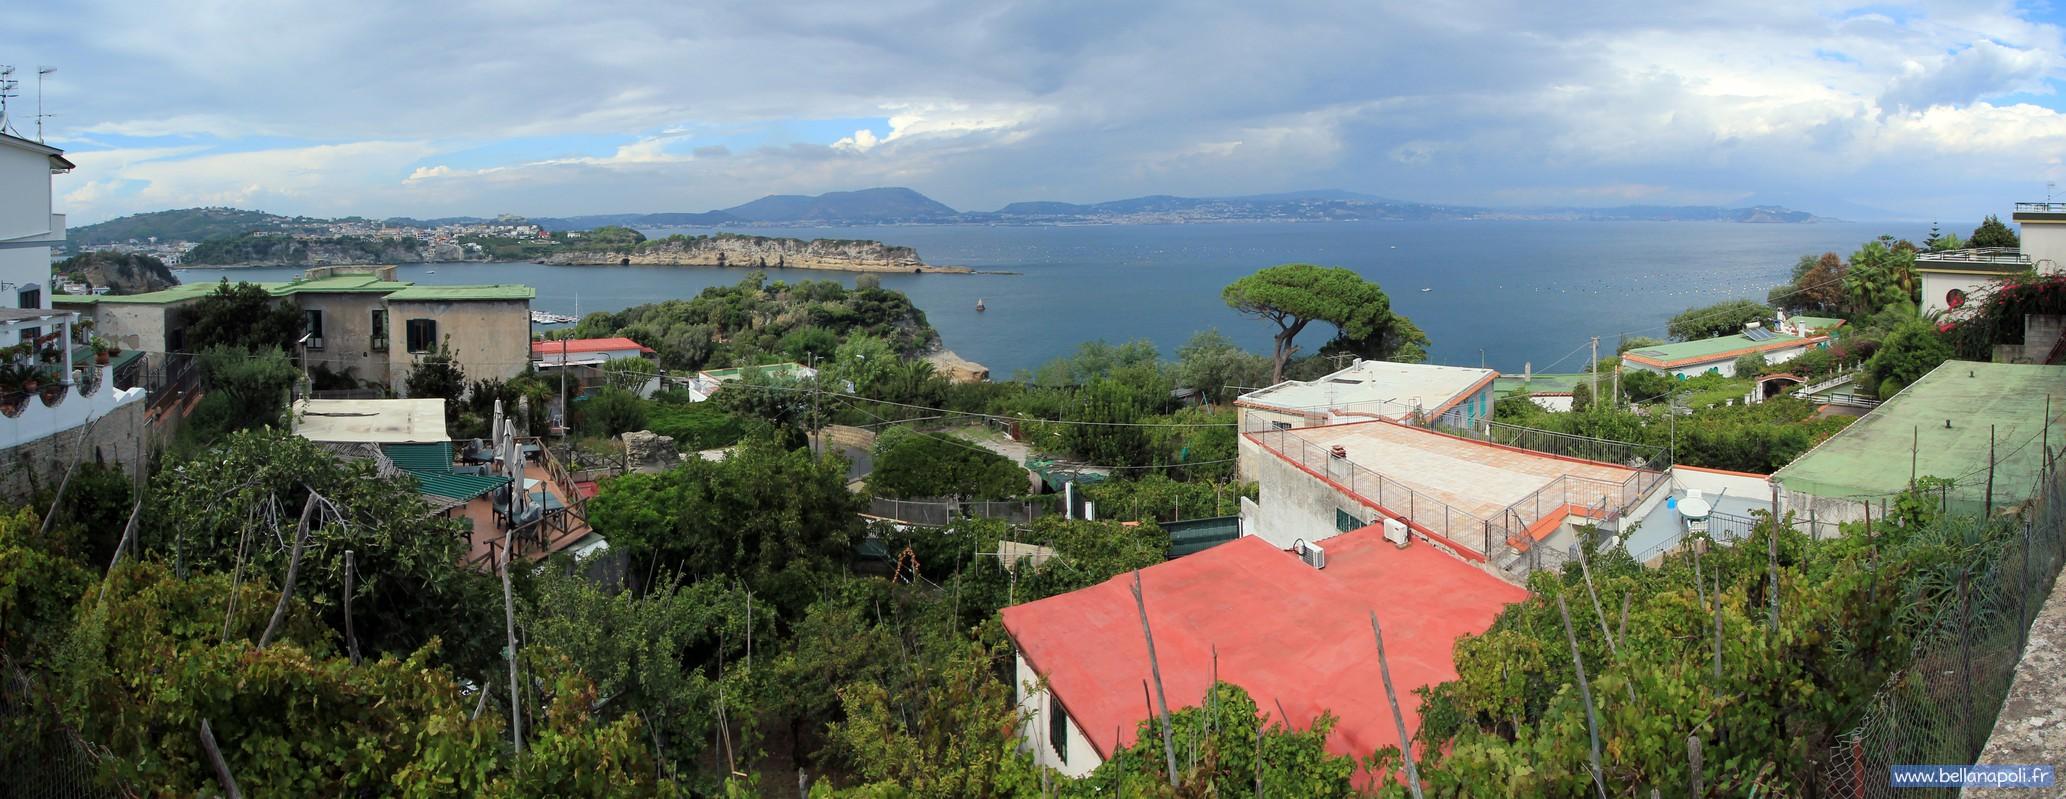 Misne Miseno  Bella Napoli  Dcouverte de Naples son